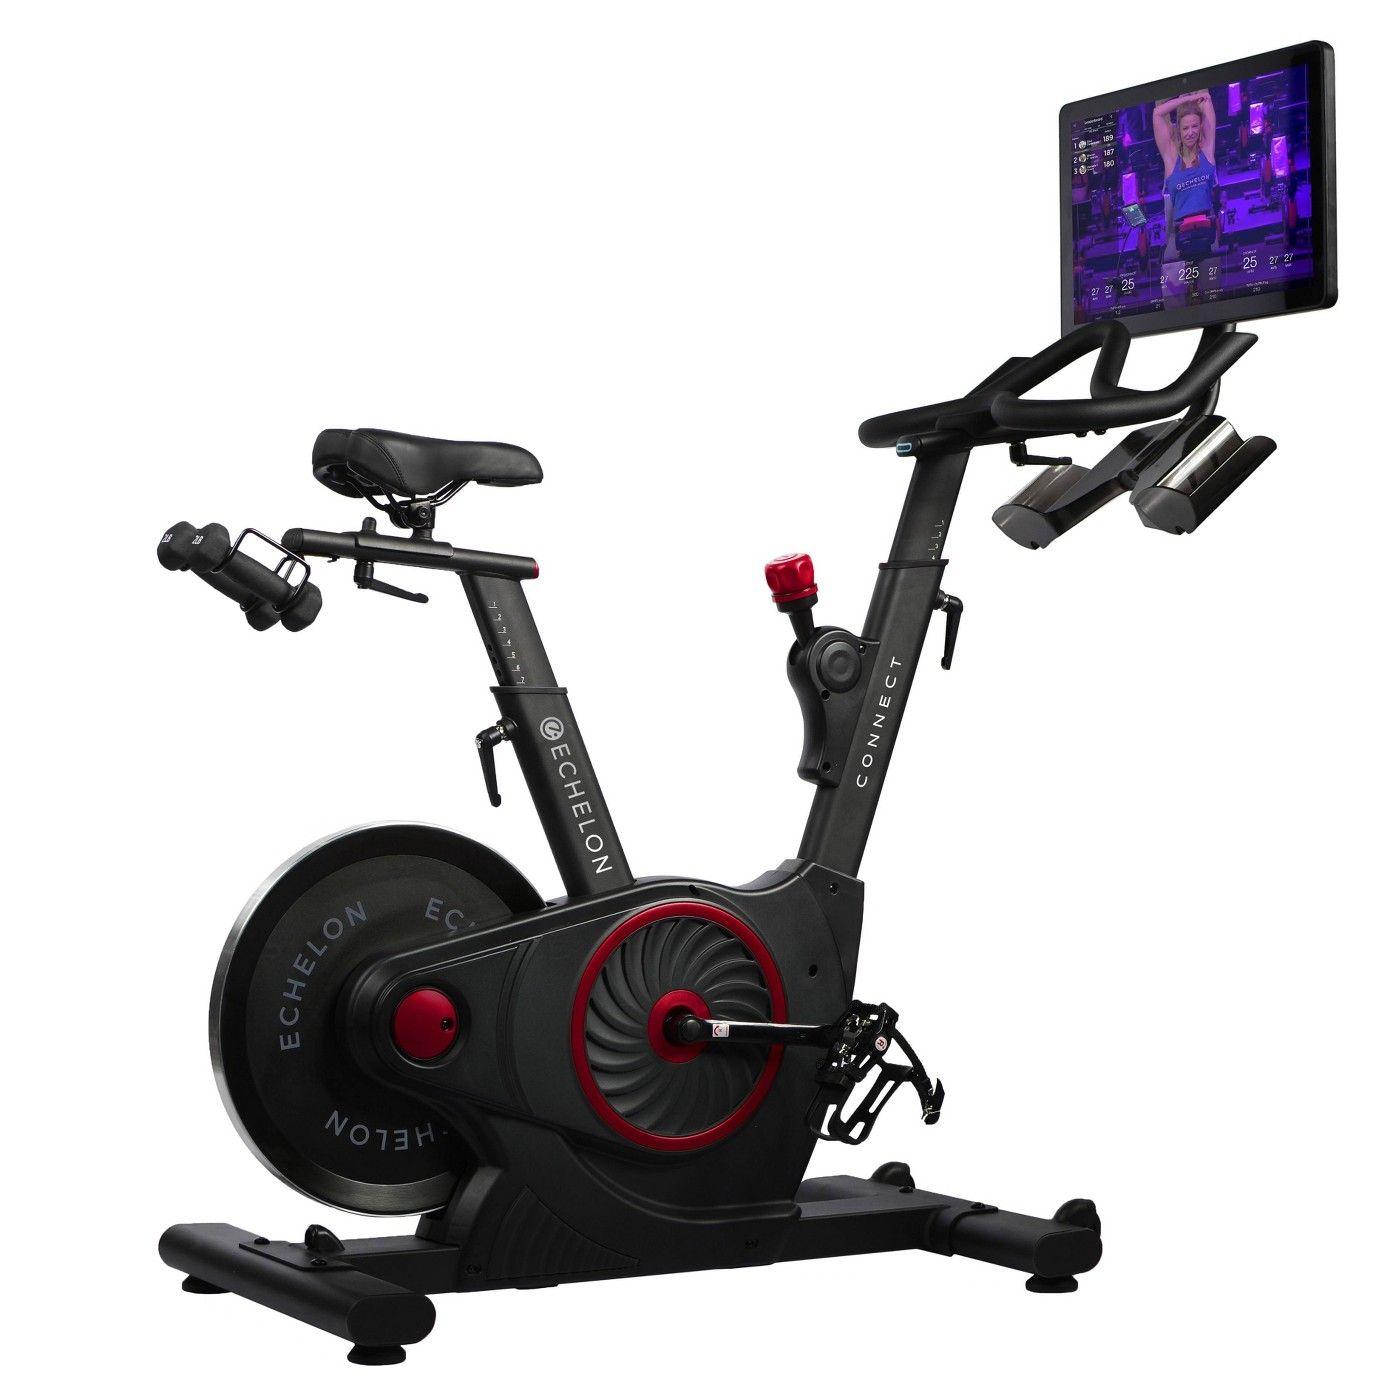 Echelon Ex5s Connect Bike Black In 2020 Biking Workout Bike Black And Red